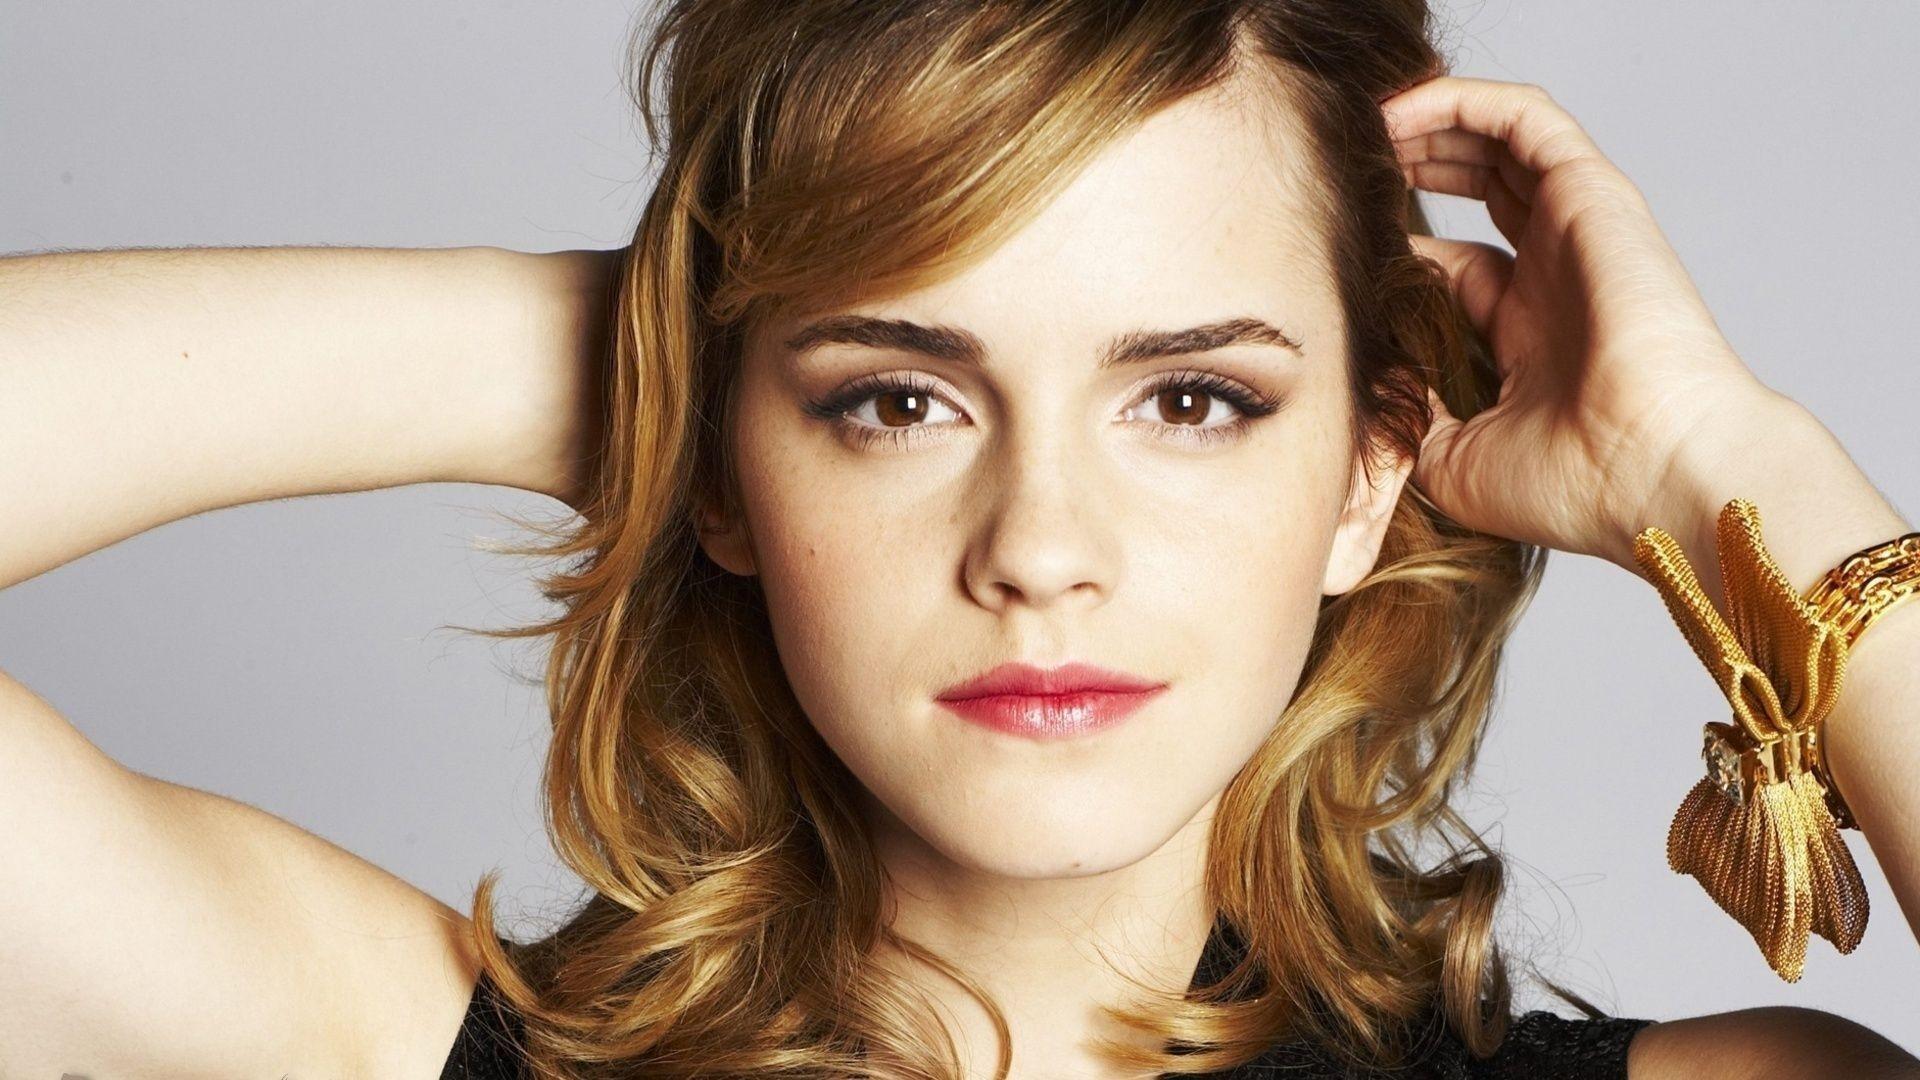 Emma Watson Hair Style: Wallpaper : Face, Long Hair, Singer, Black Hair, Fashion